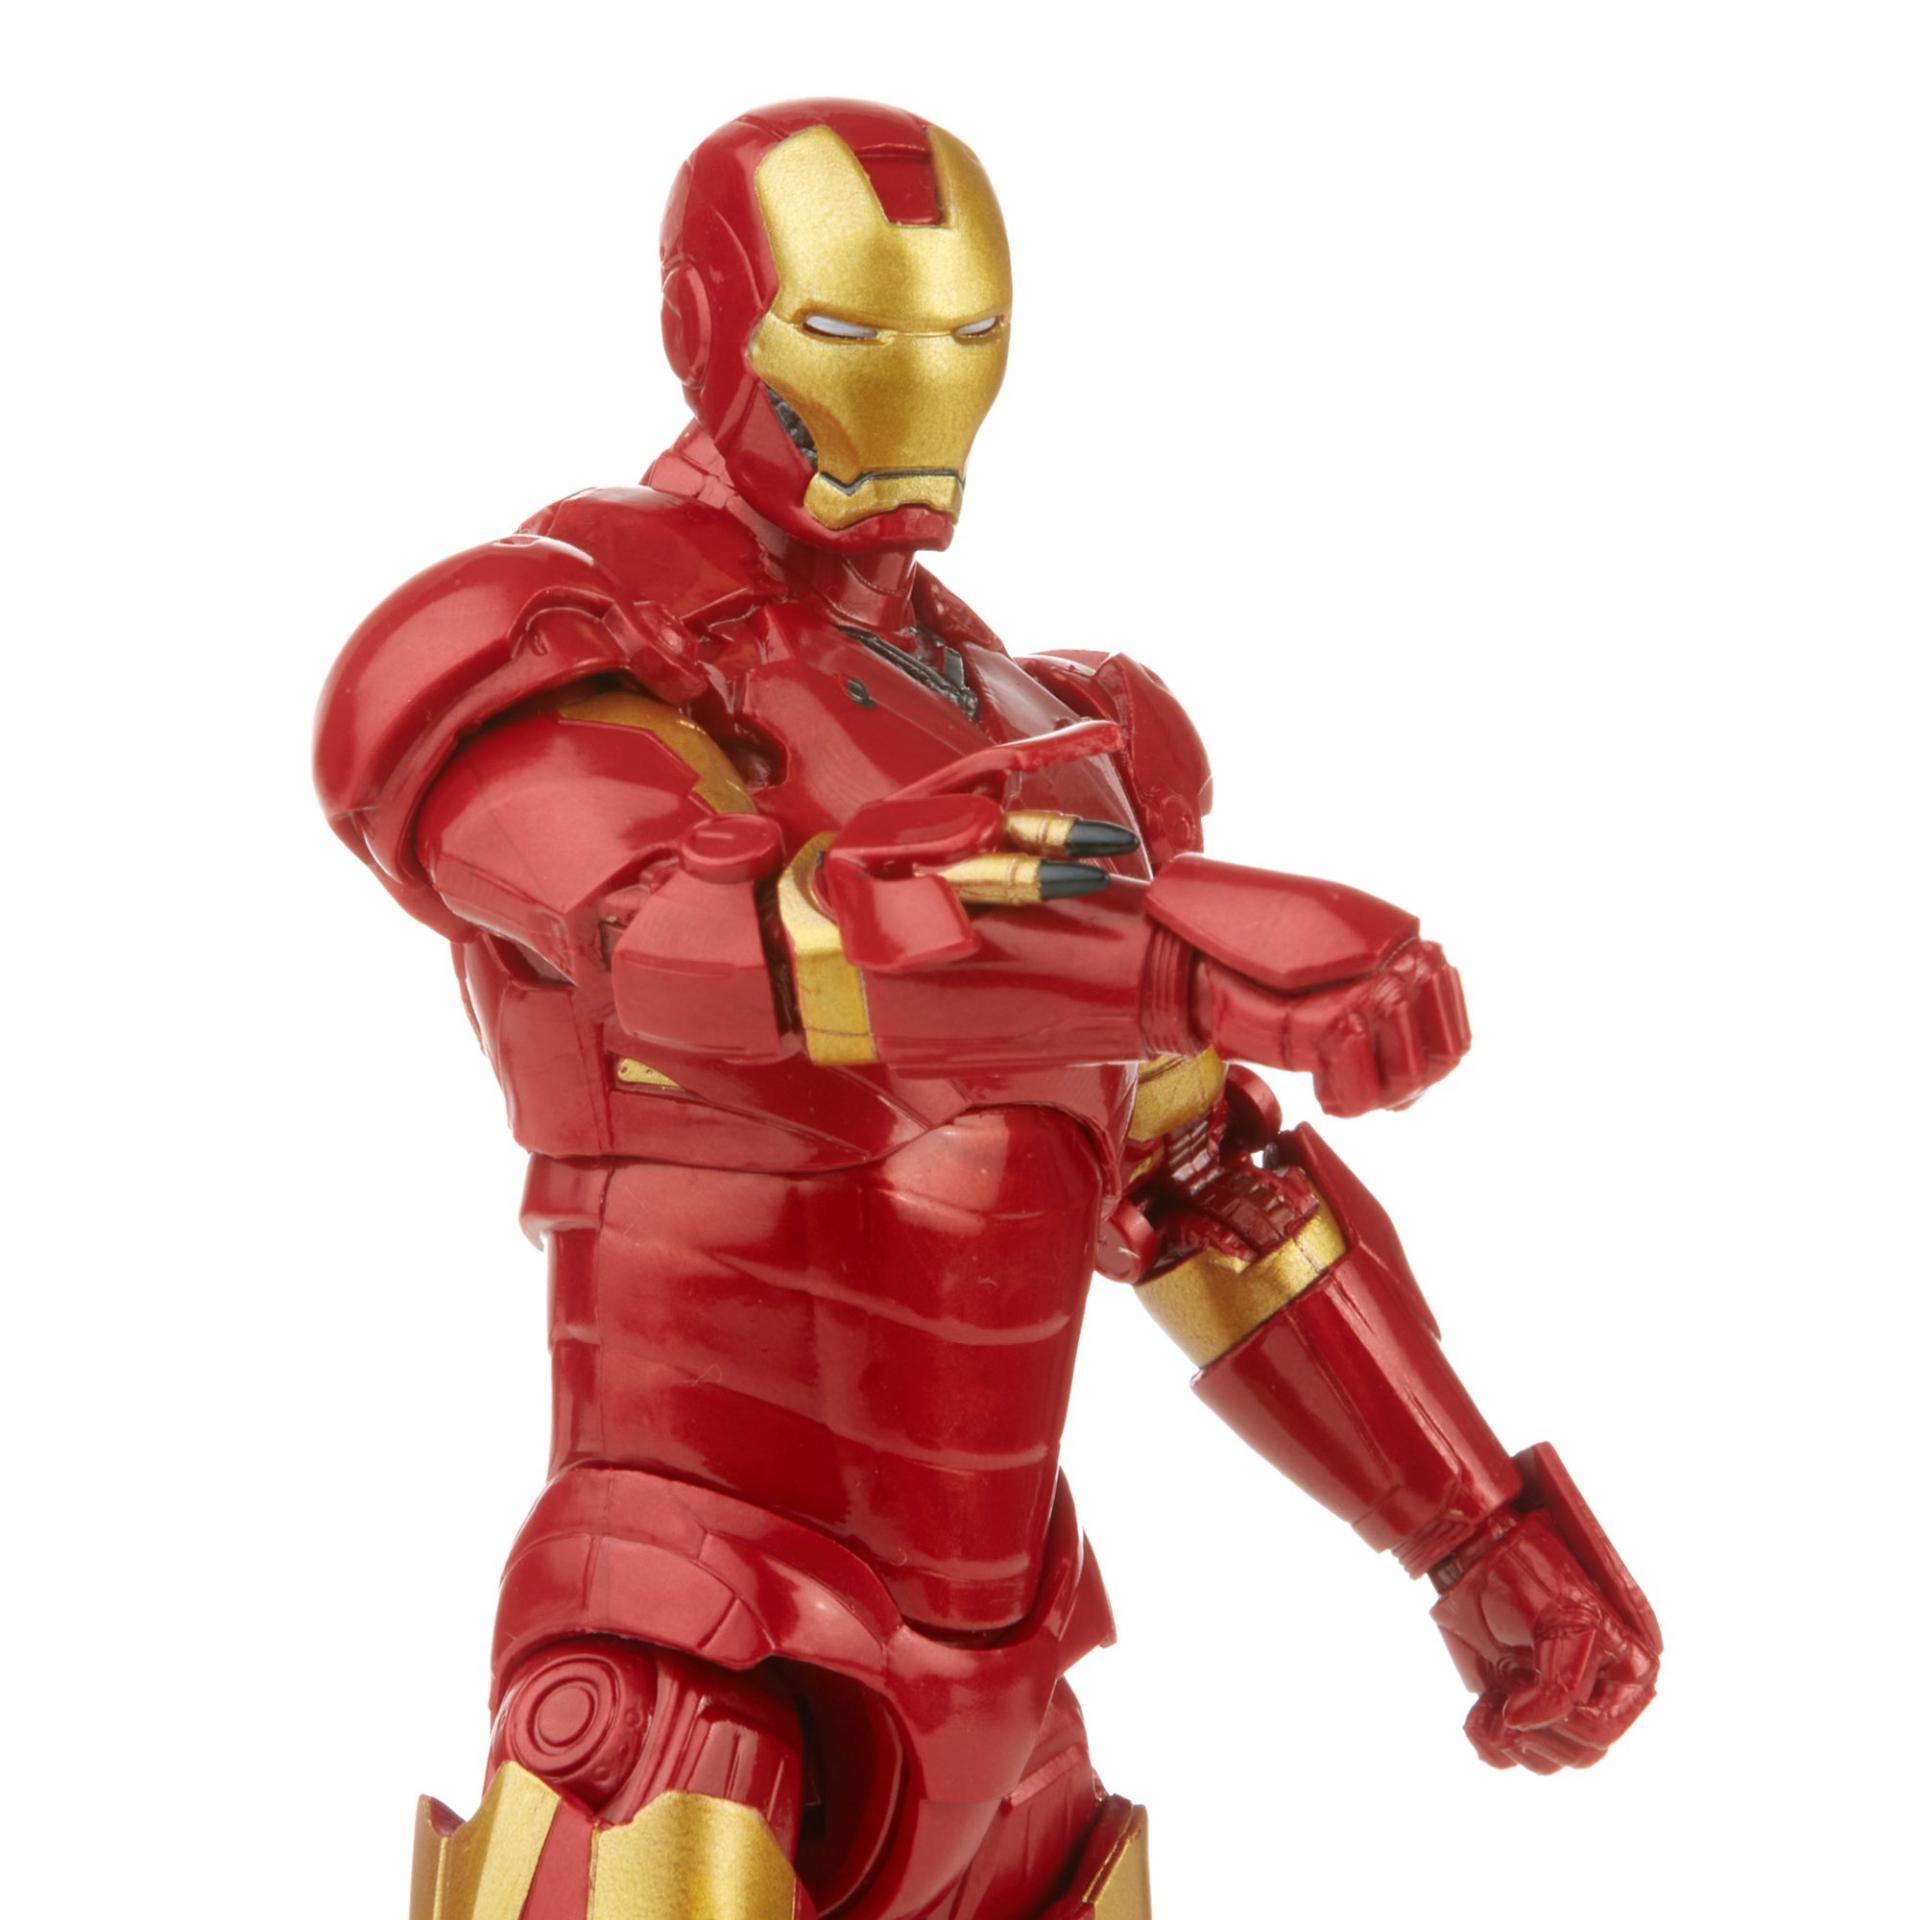 Marvel legends series hasbro iron man mark 310